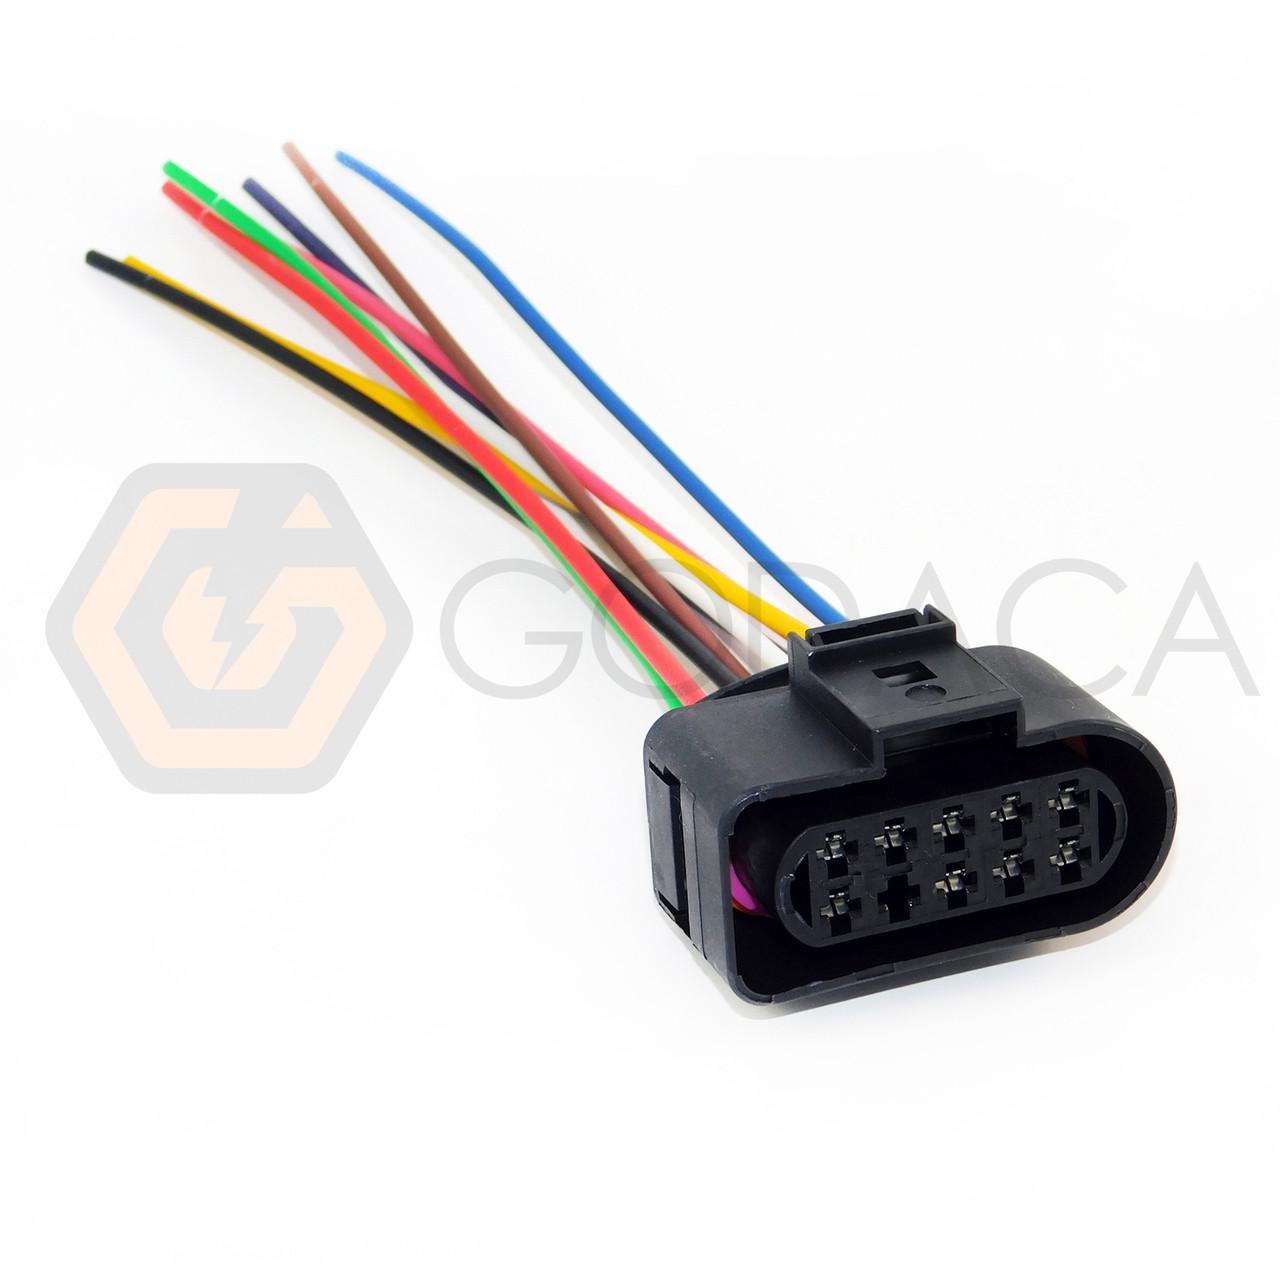 small resolution of 1 x connector headlight for audi vw seat skoda 1j0973735 1j0 973 735 9 way ford godaca llc